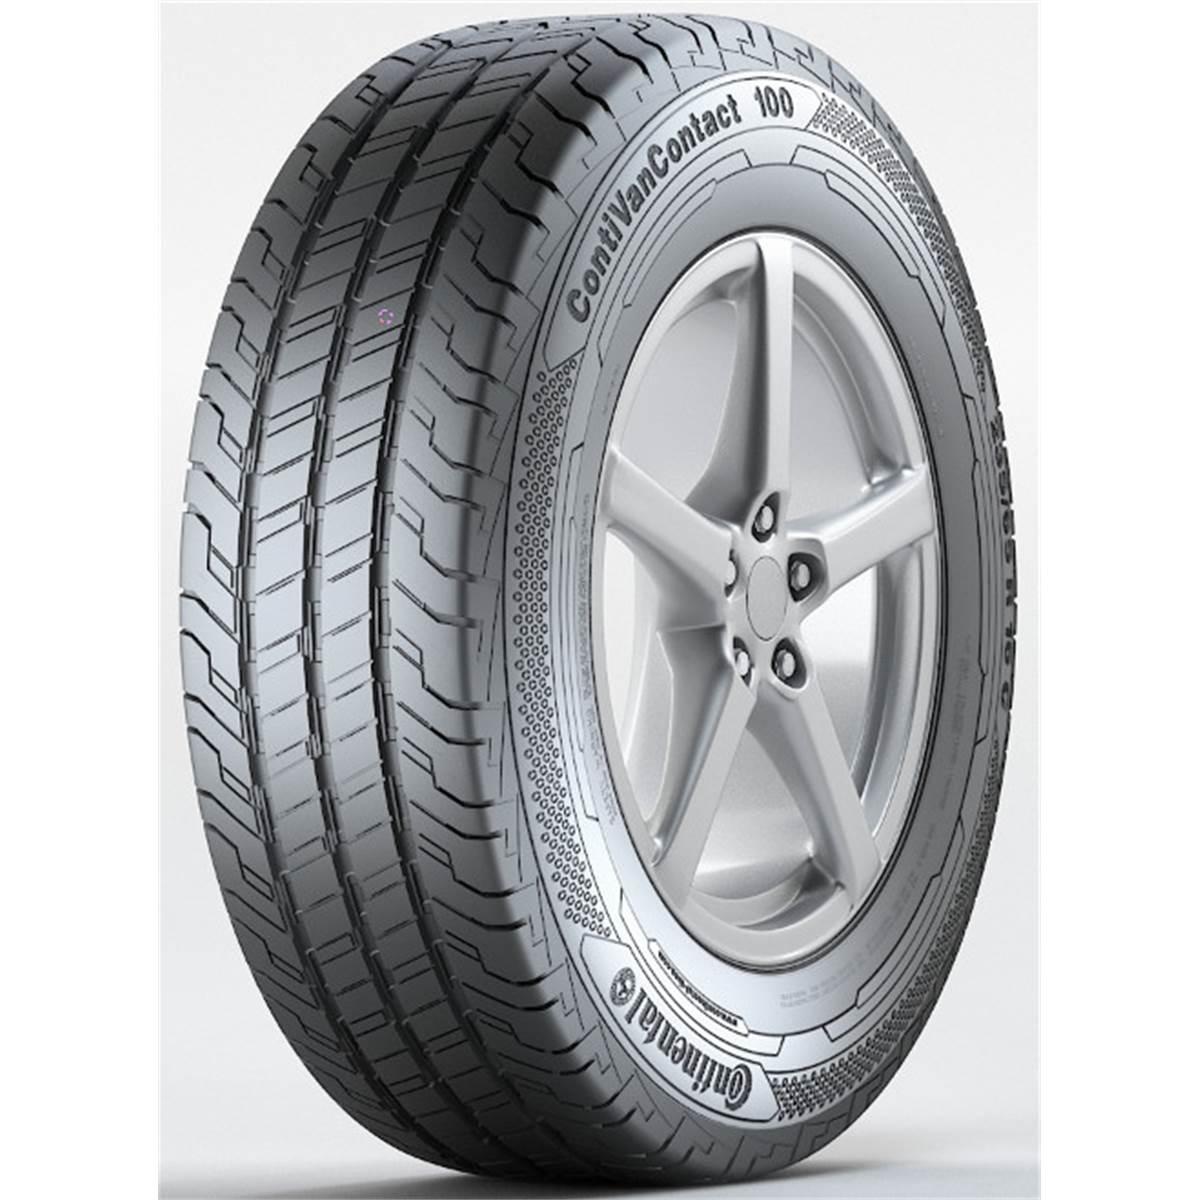 continental vanco 215 70 r15 achat de pneus continental vanco 215 70 r15 pas cher pneu. Black Bedroom Furniture Sets. Home Design Ideas